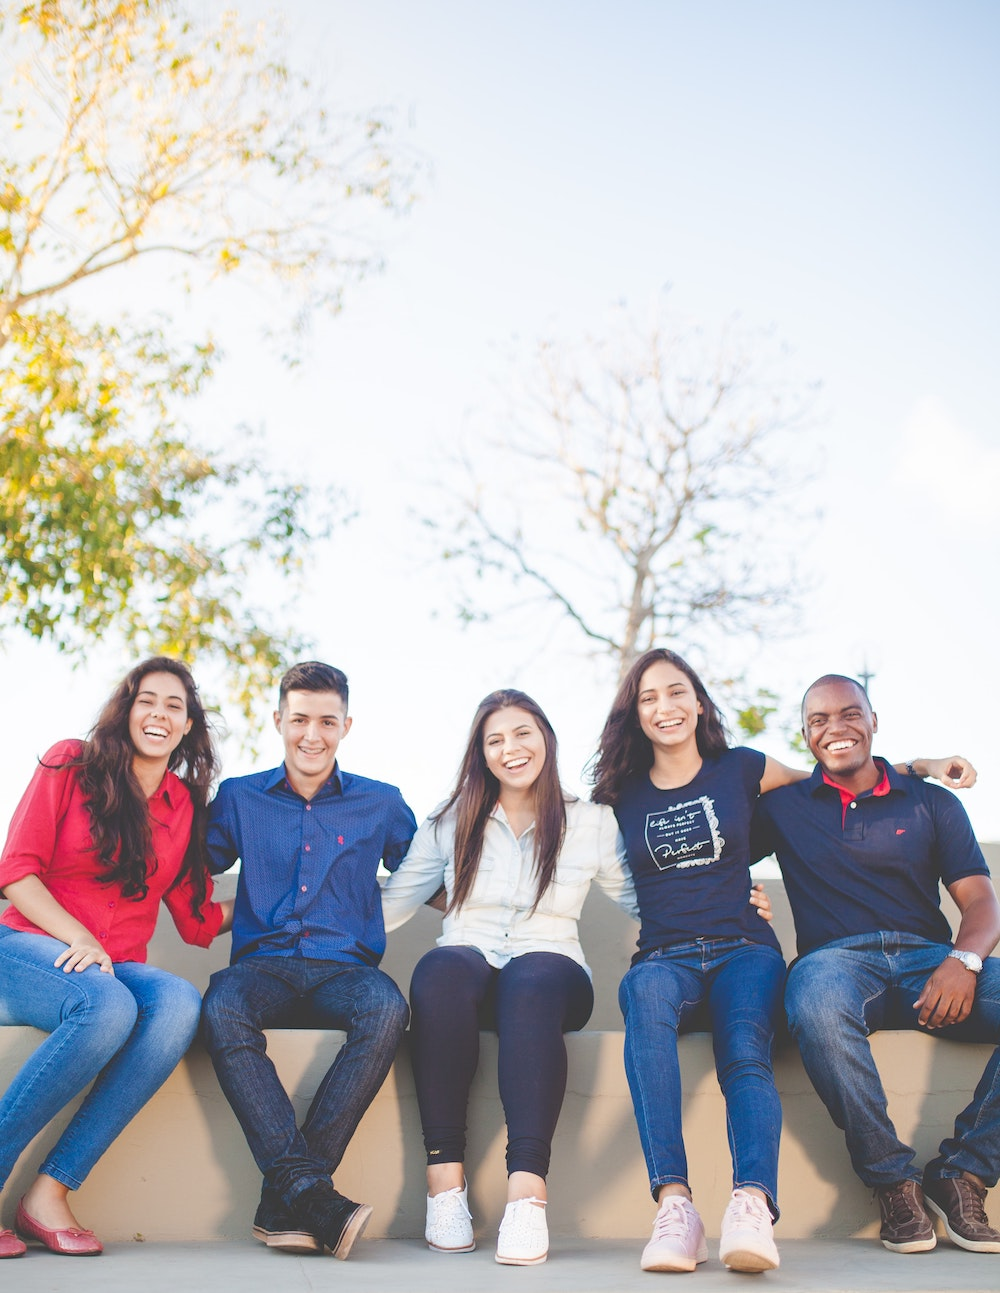 equipe-collegues-cohesion